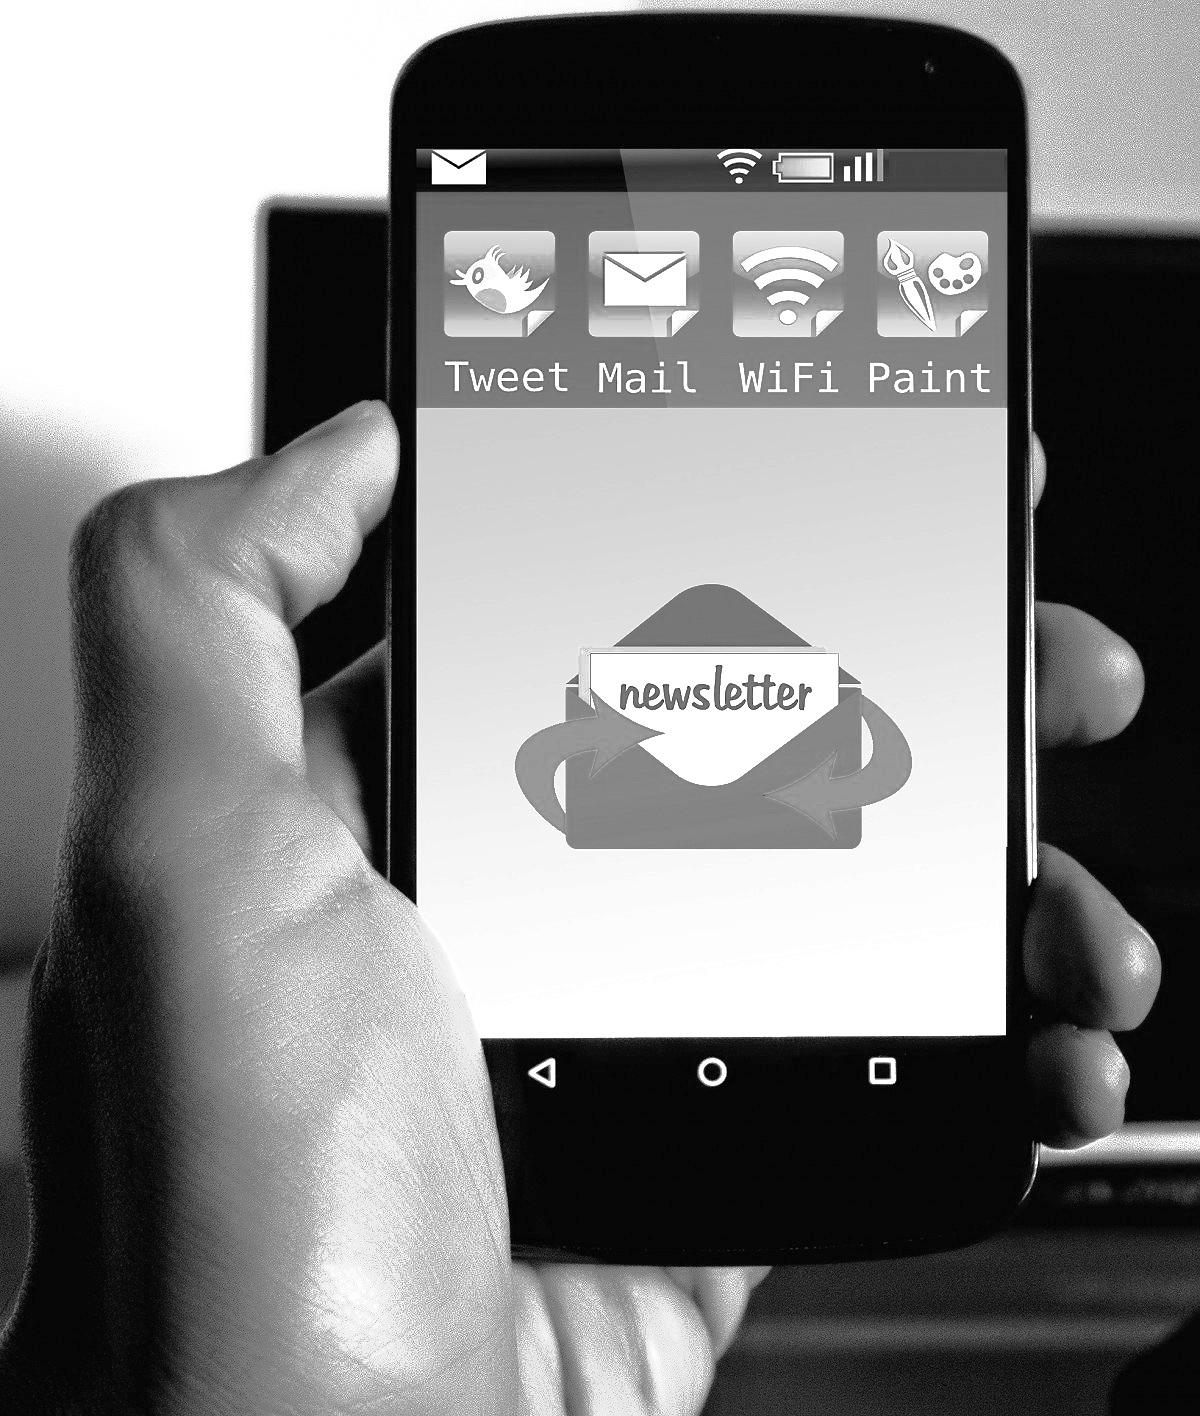 newsletter_message_smartphone_mobile_phone_app_icon_social_media_button-916936.jpg